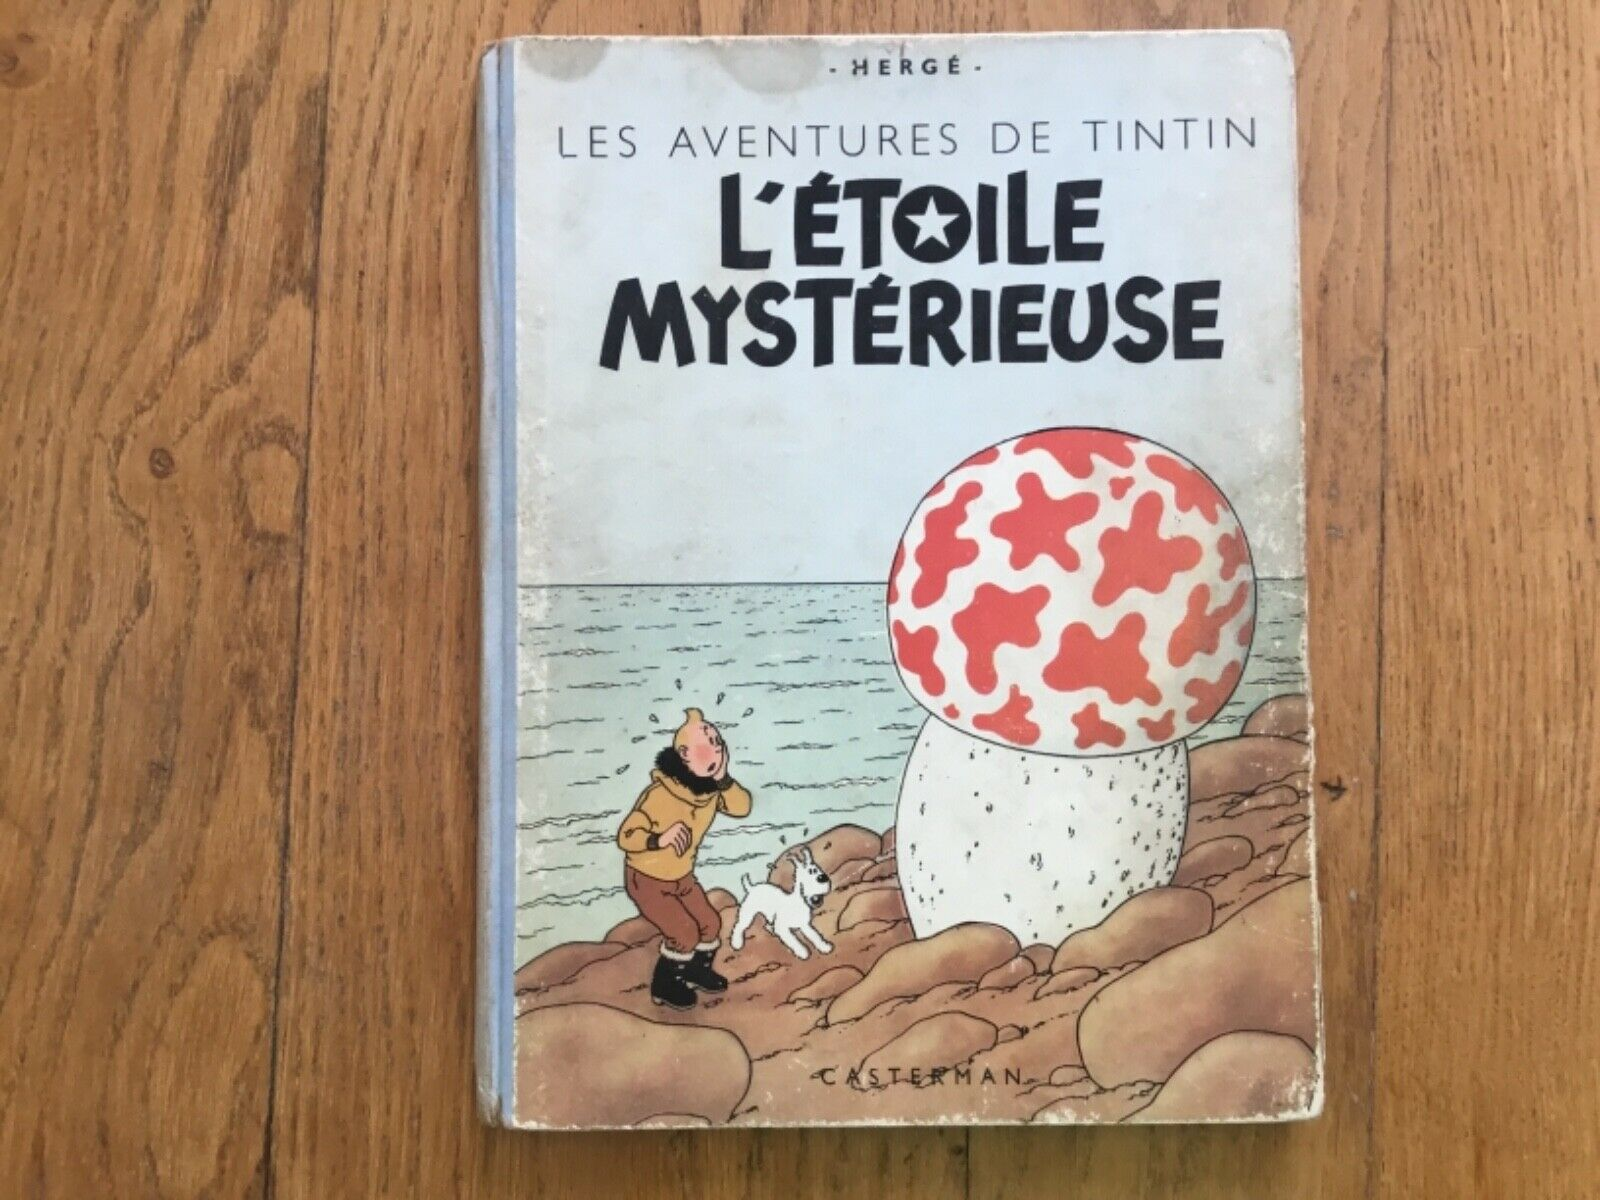 TINTIN - L'étoile Mystérieuse - Edition B1 -1946  - BE - Hergé